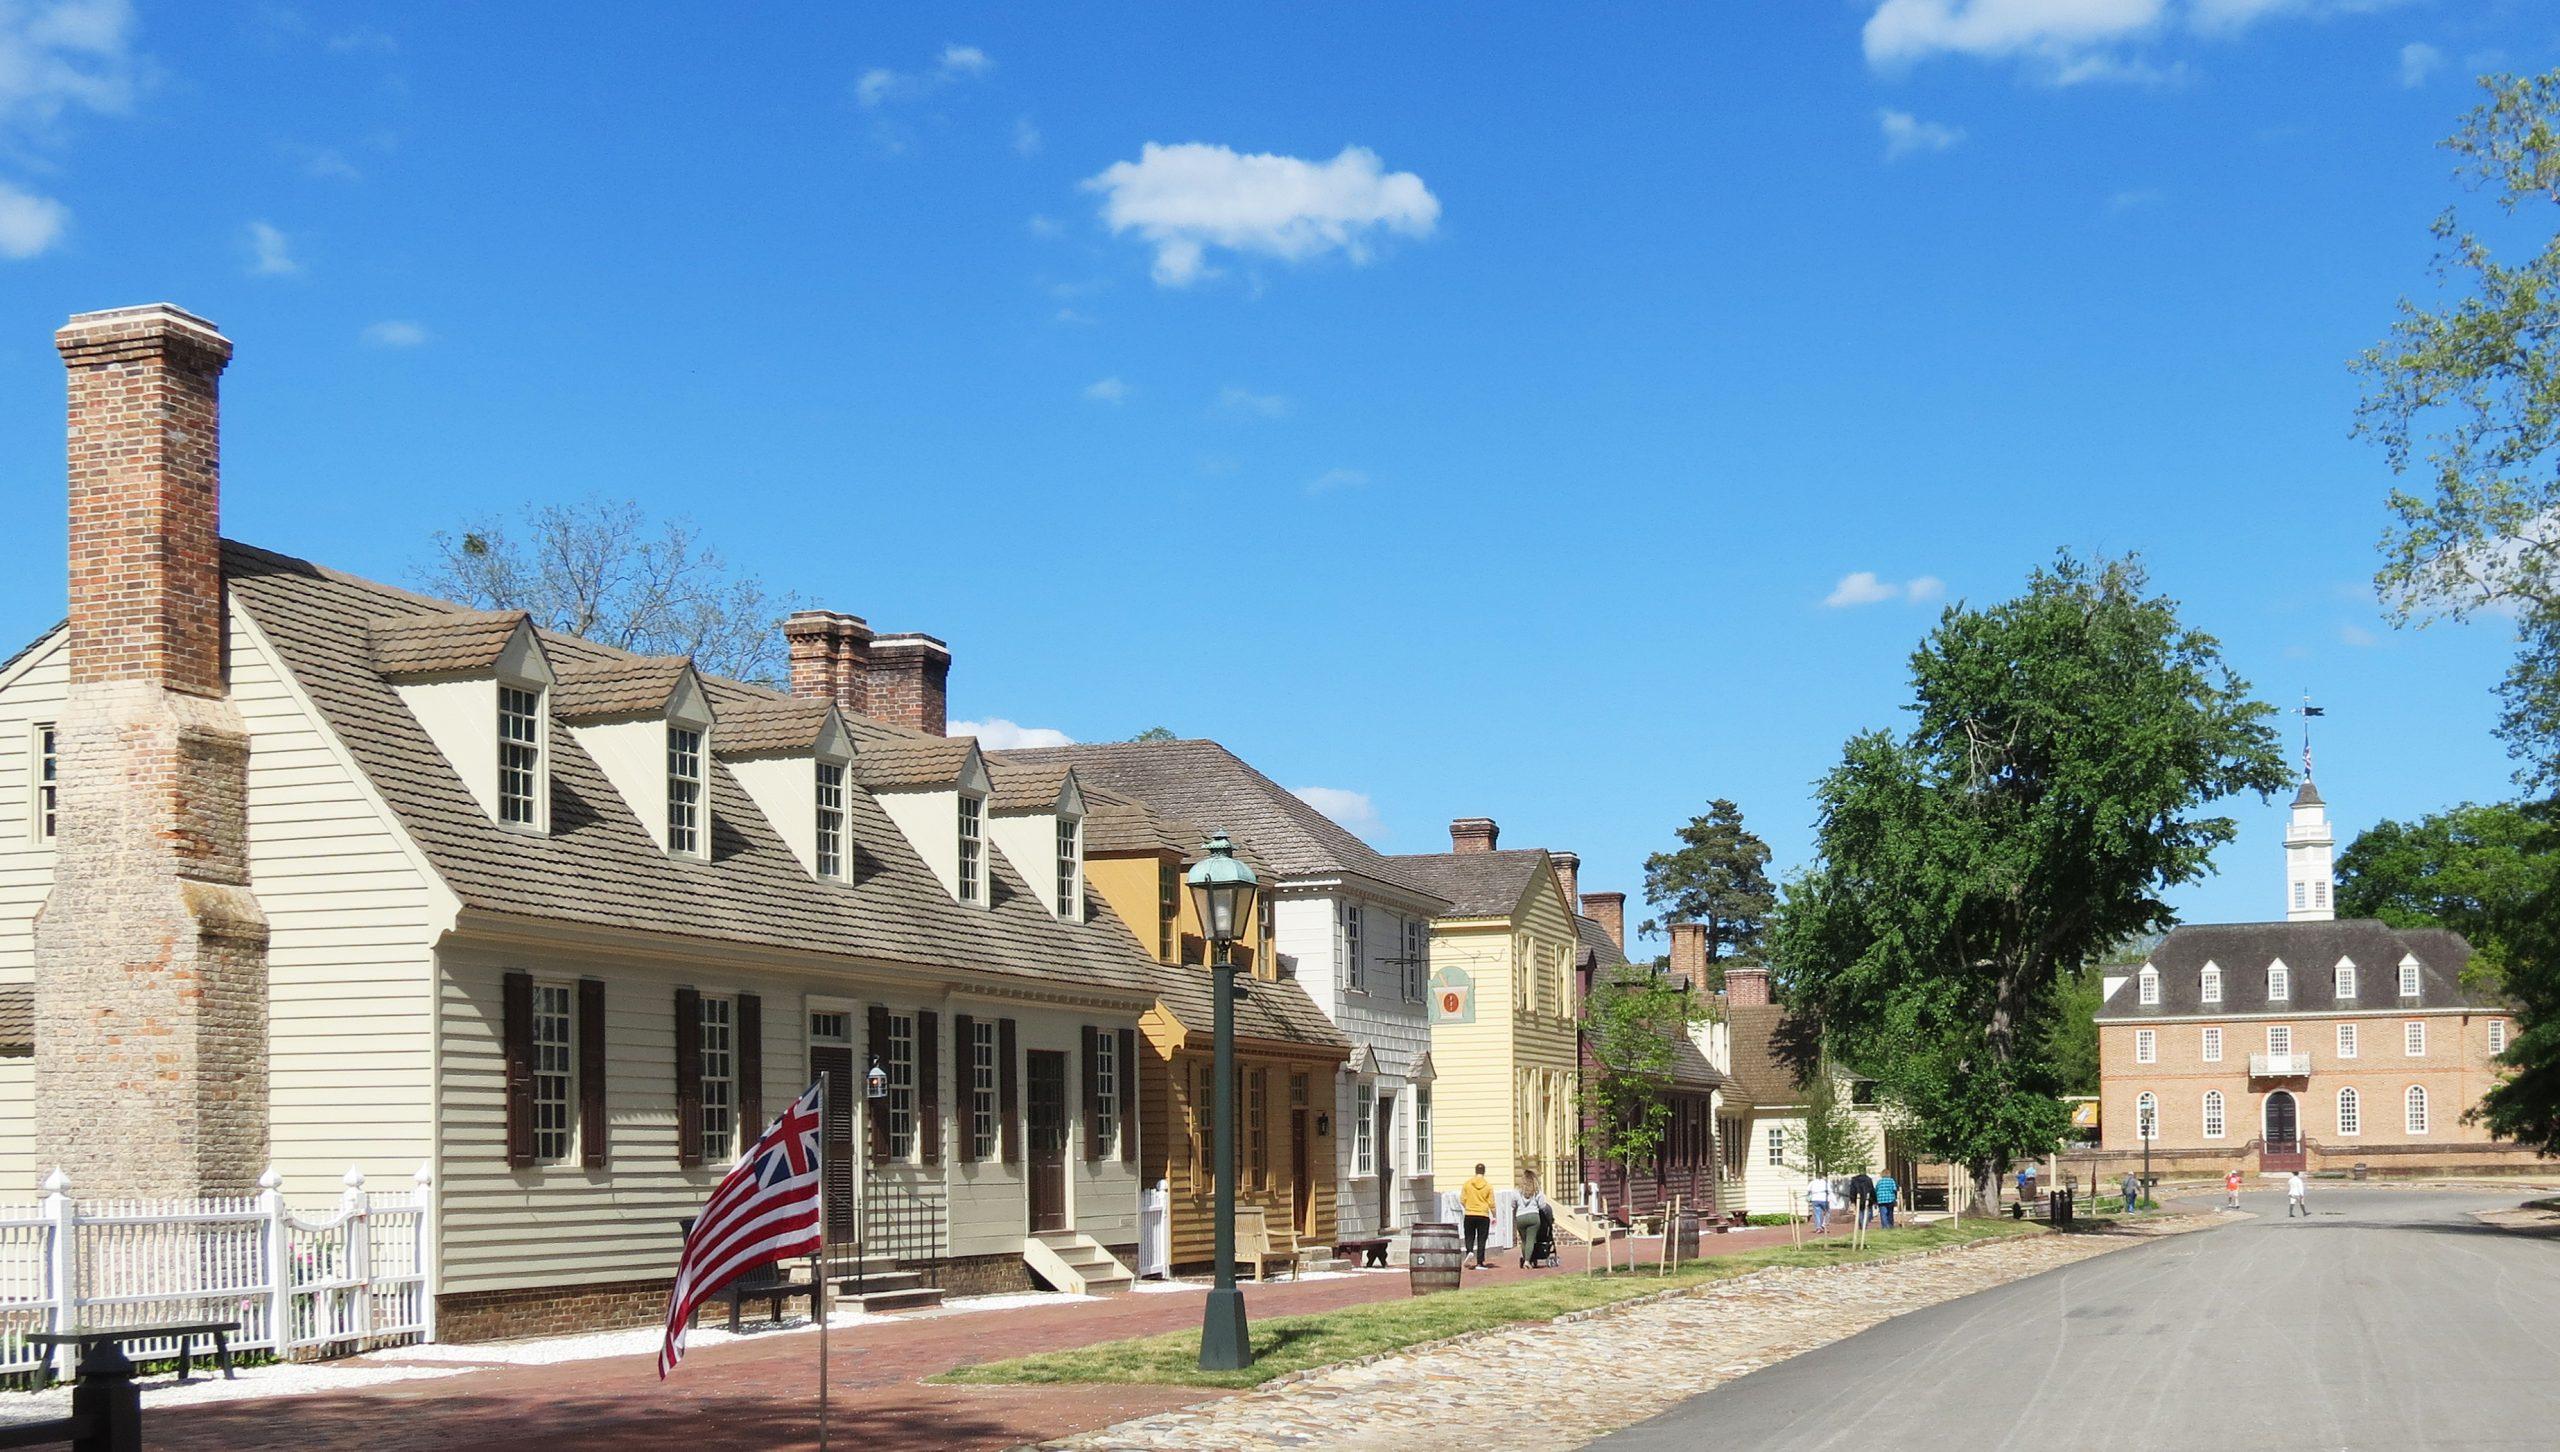 Williamsburg Historic District